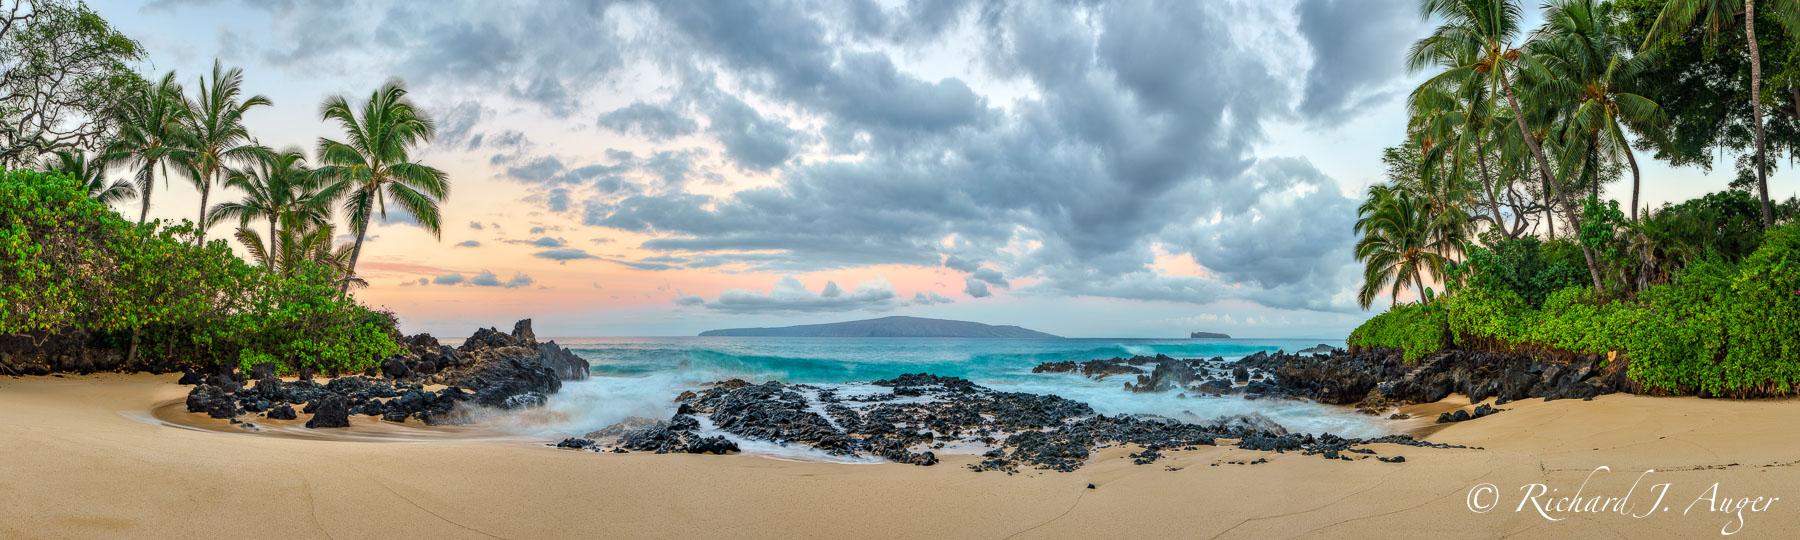 Maui, Hawaii, Cove, Beach, Sunrise